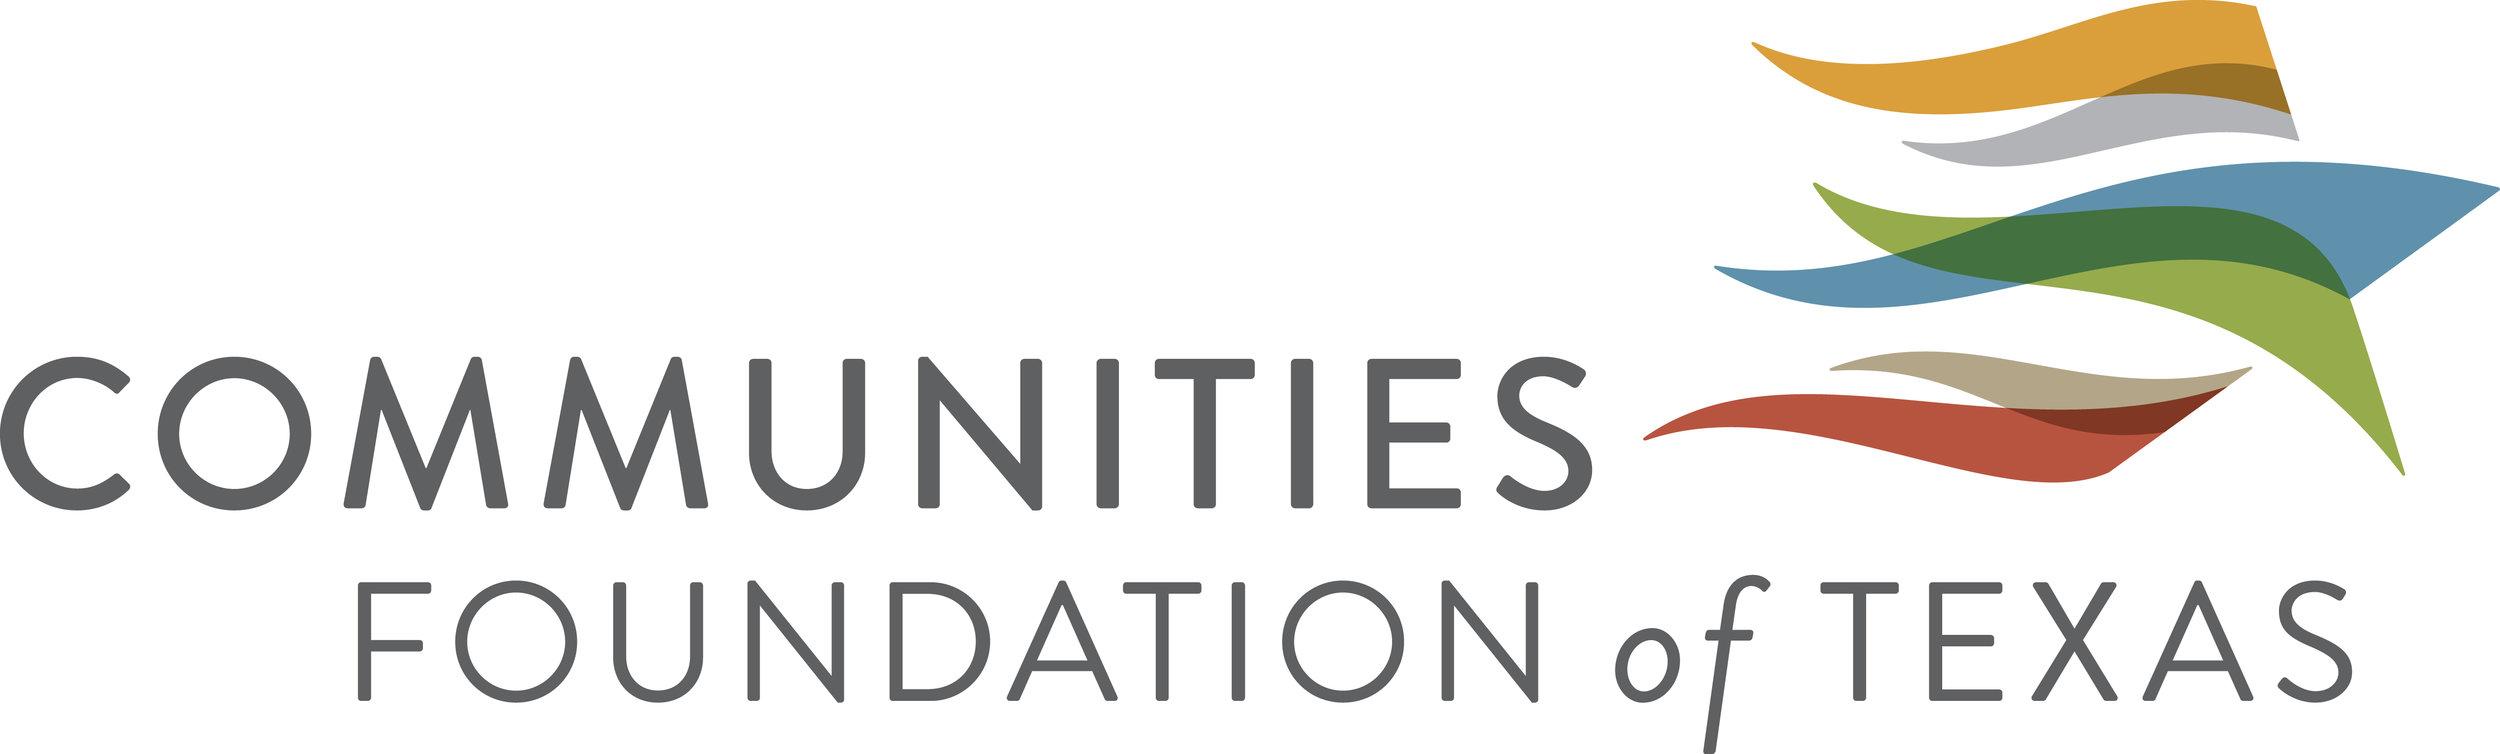 CFT_Logo_RGB HiRes.jpg